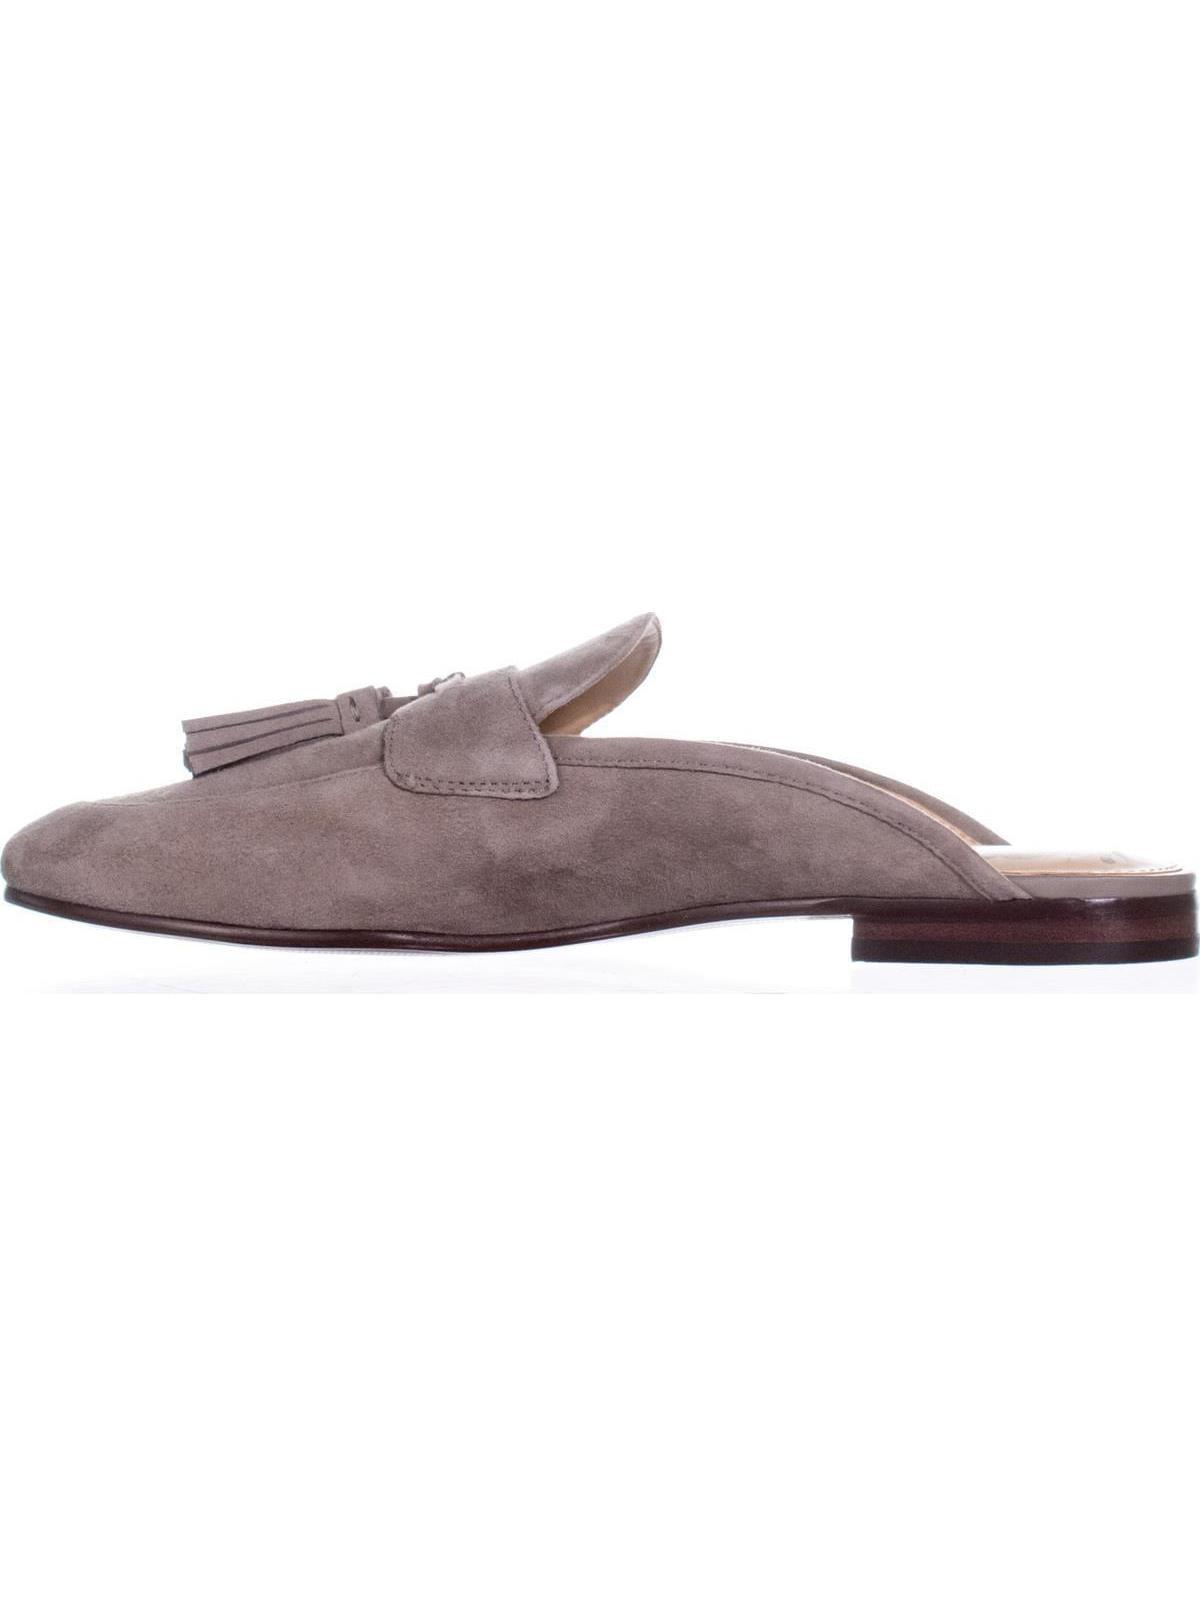 8cea7d420 Sam Edelman - Womens Sam Edelman Paris Backless Tassel Loafers ...